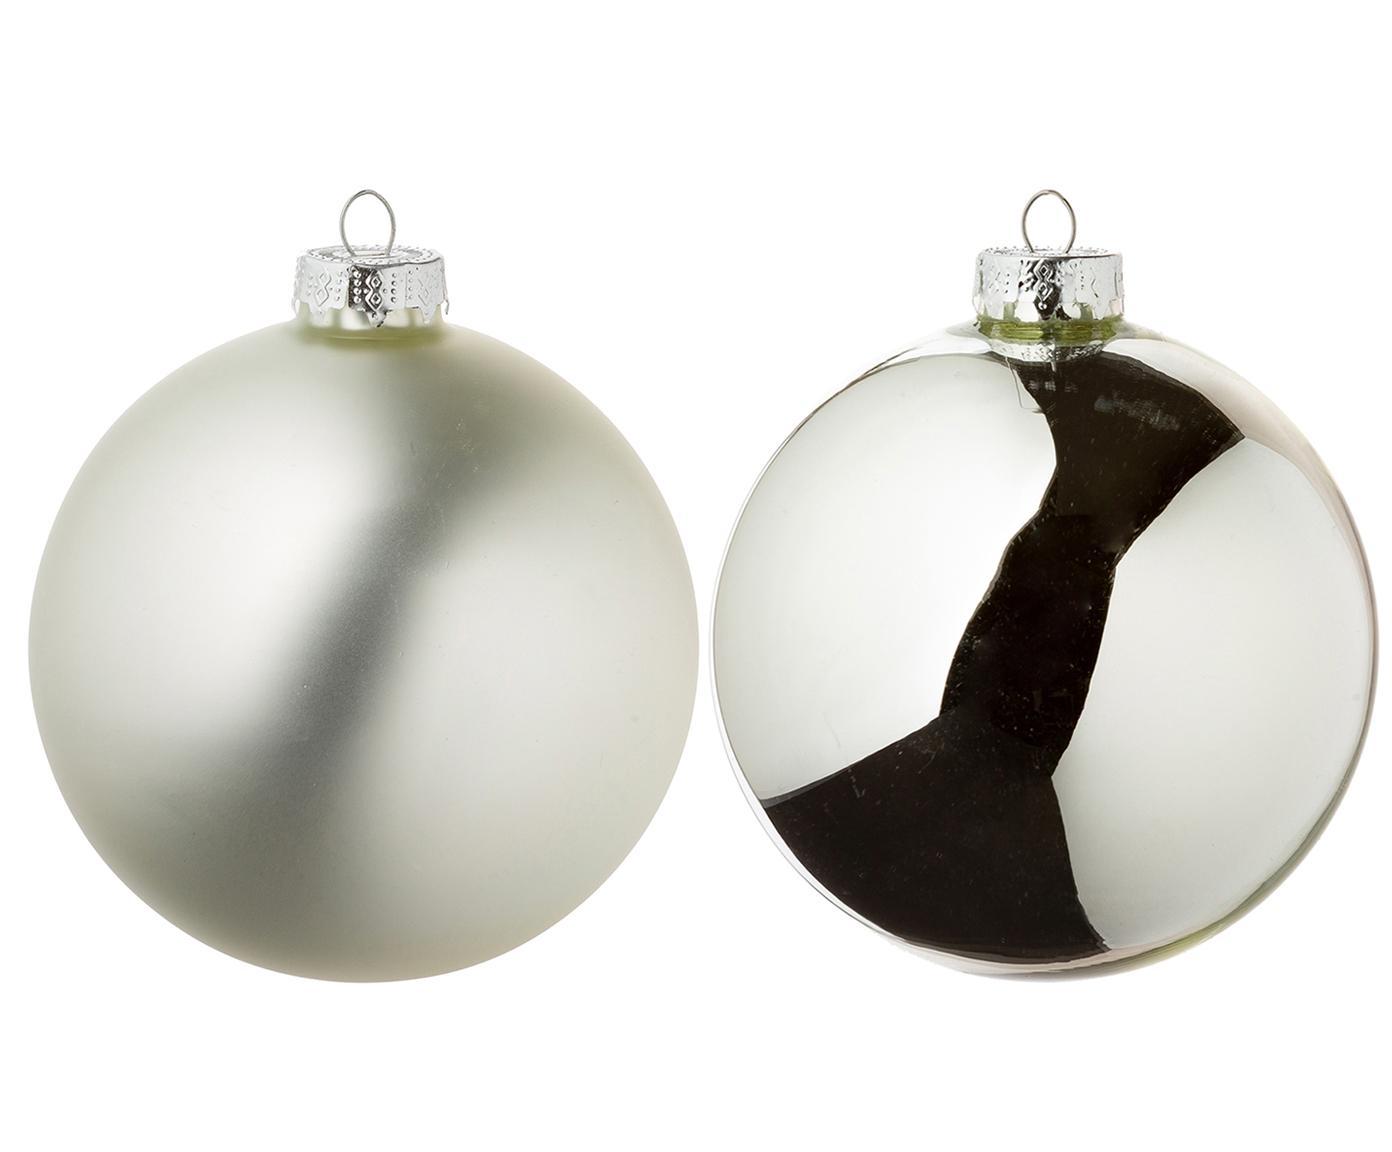 Set de bolas de Navidad Roman, 8pzas., Vidrio, Plateado, Ø 10 cm